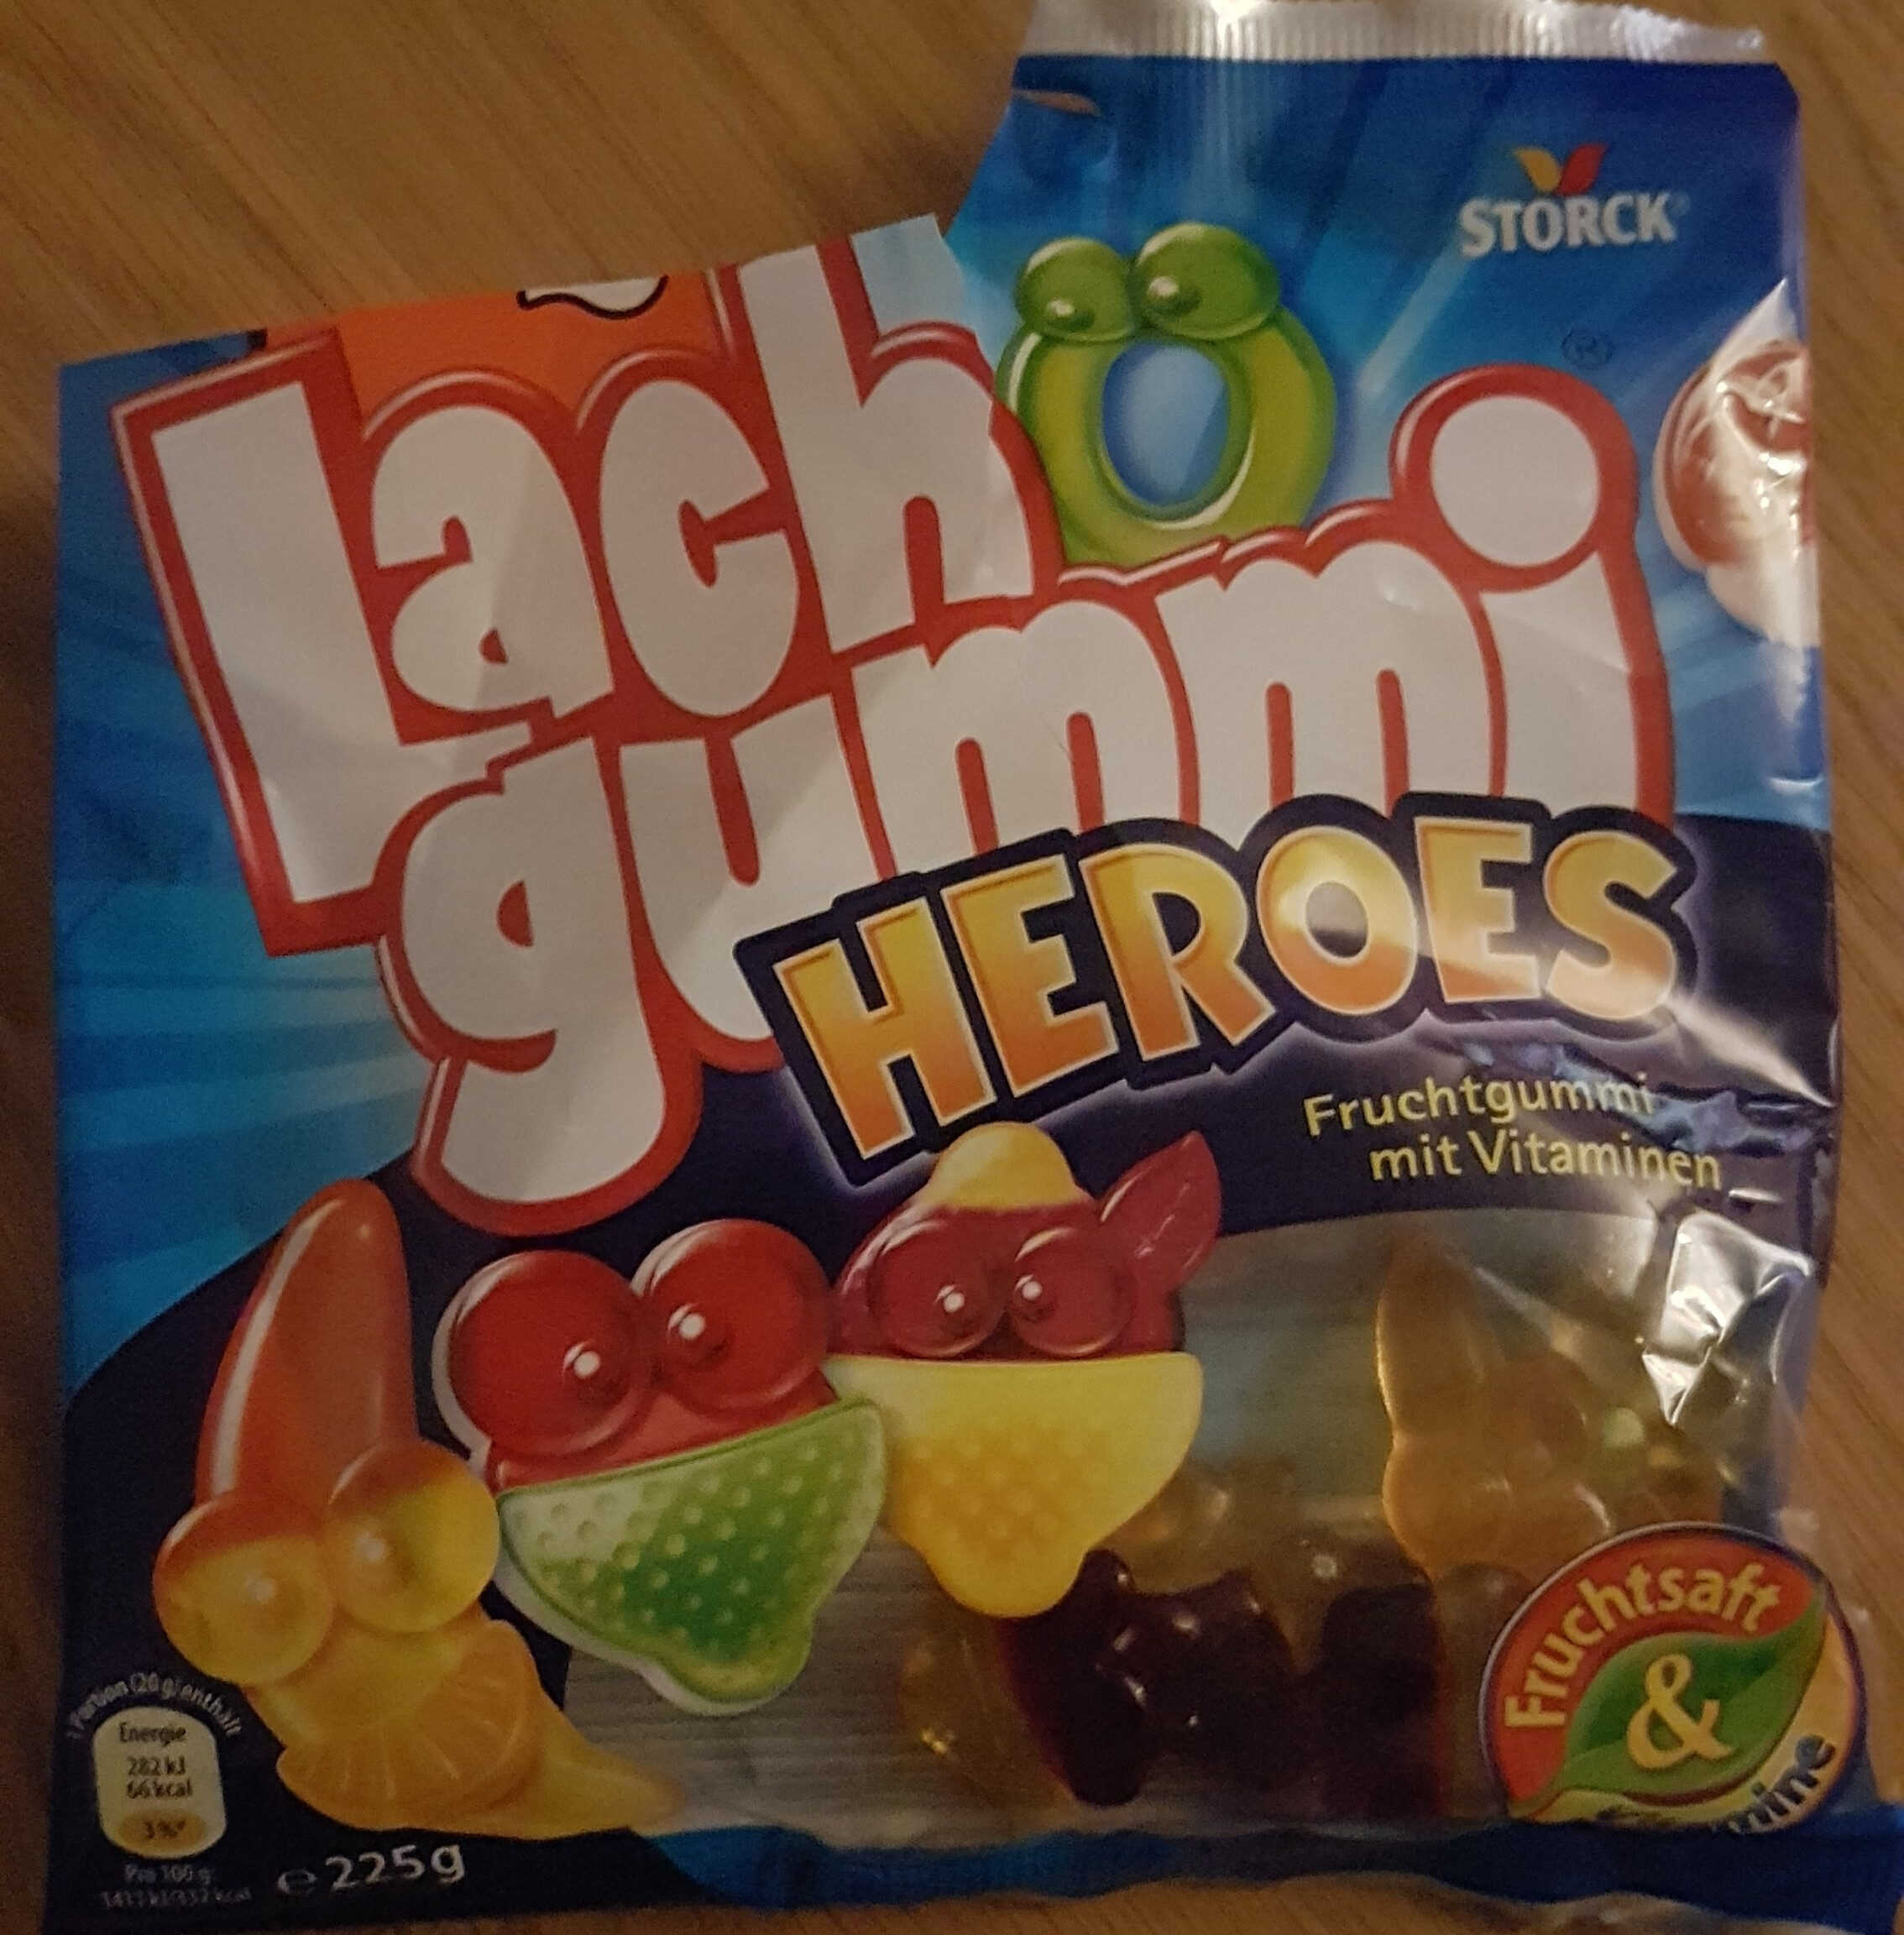 Lachgummi Heroes - Product